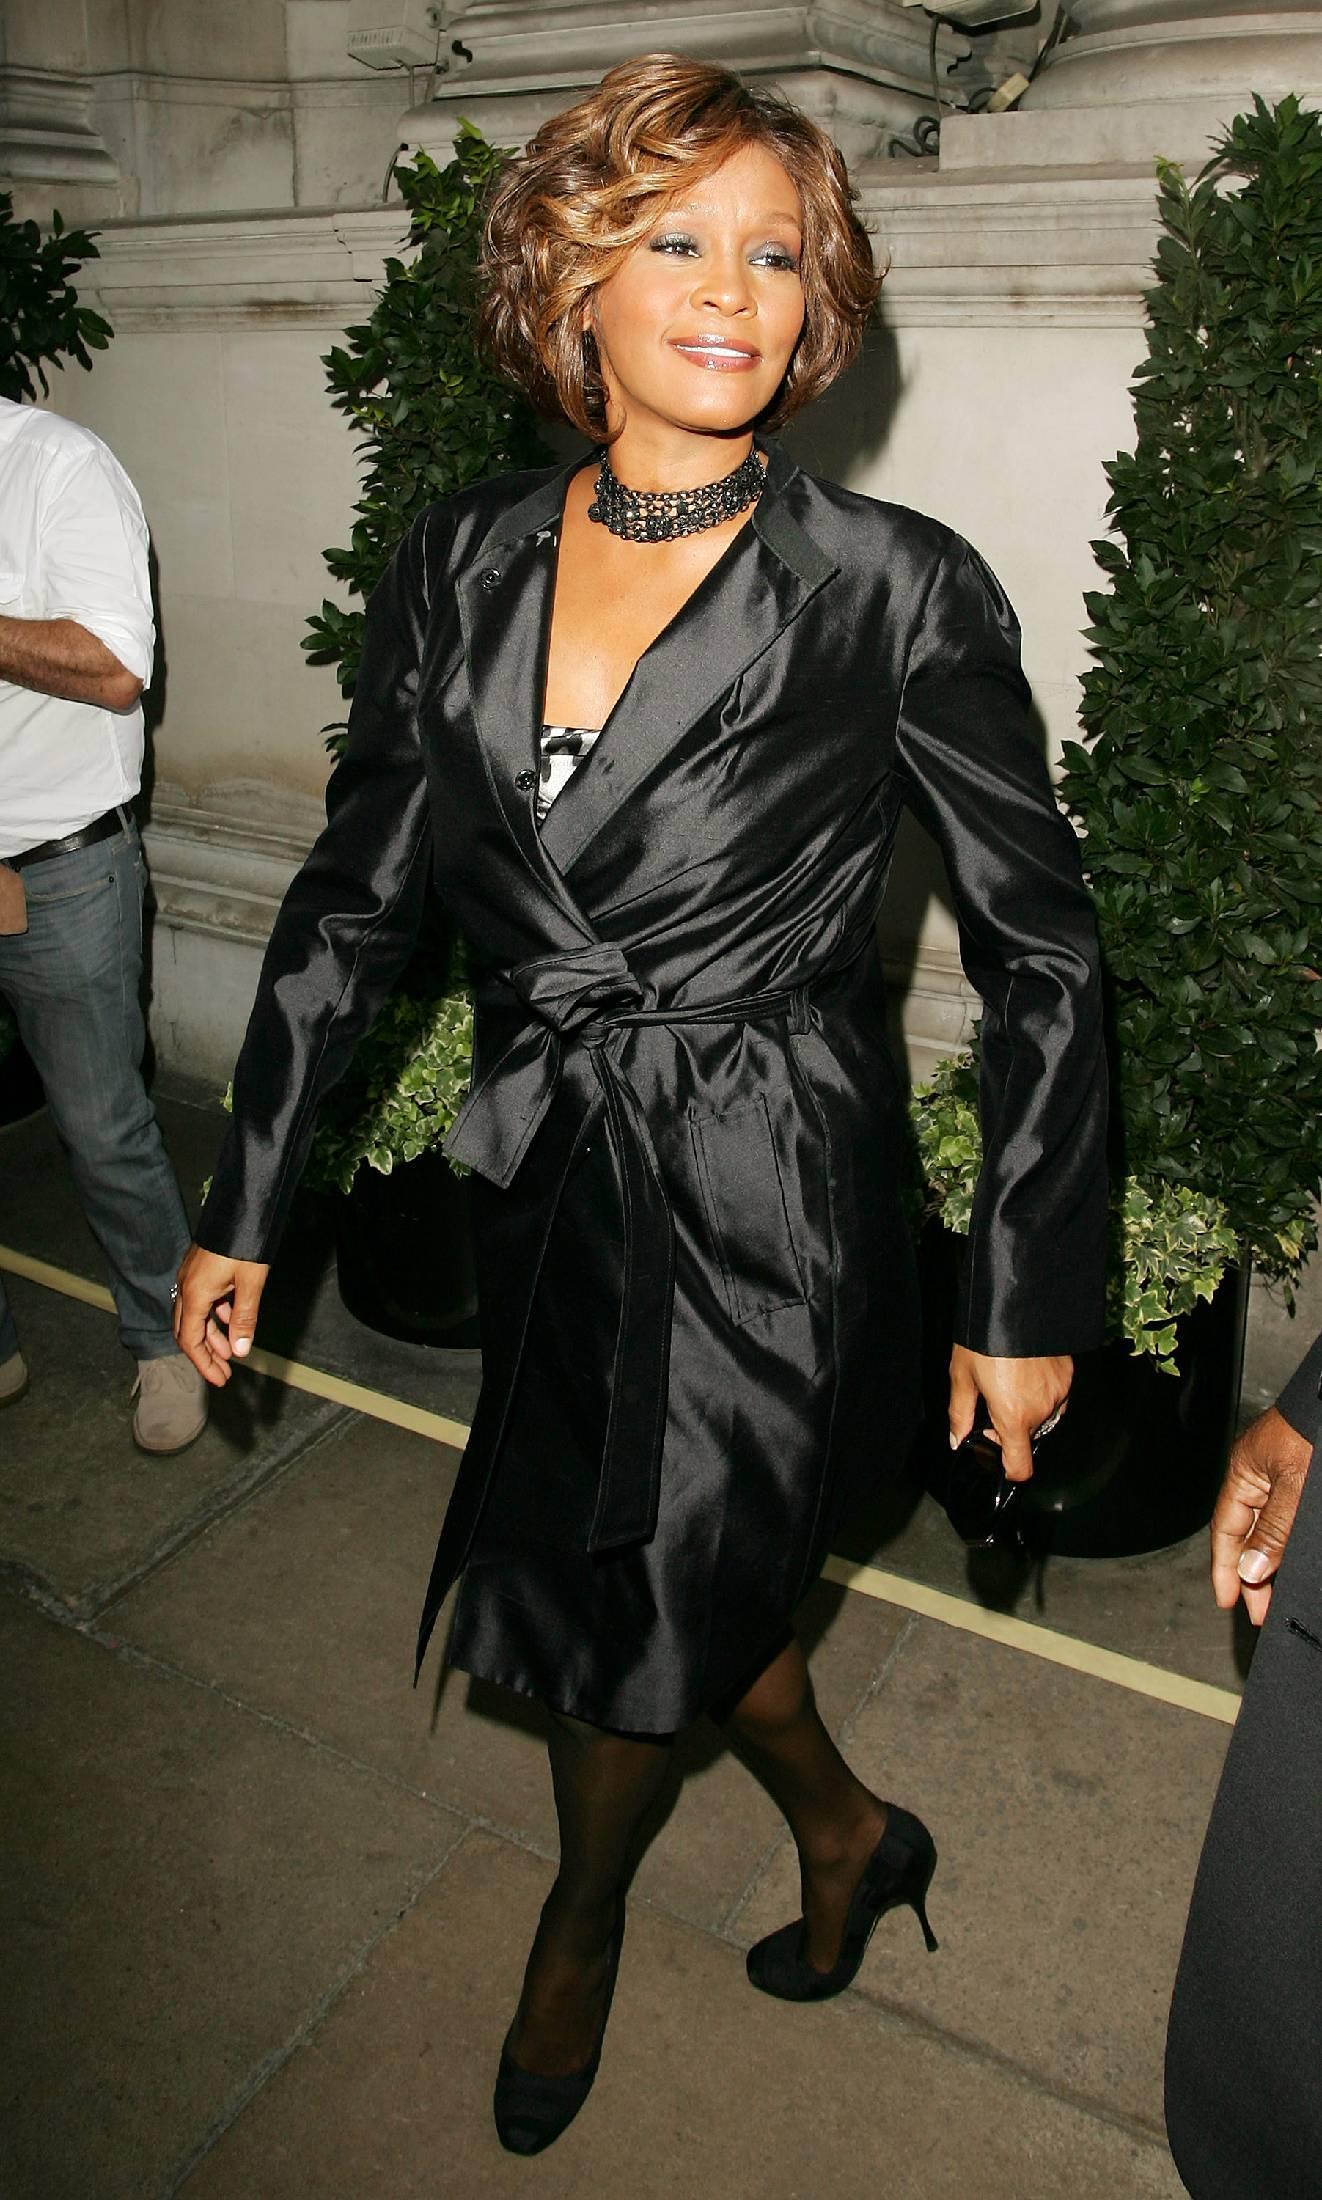 04748_celeb-city.org-The_Elder-Whitney_Houston_2009-07-14_-_arrives_at_a_London_hotel_443_122_57lo.jpg